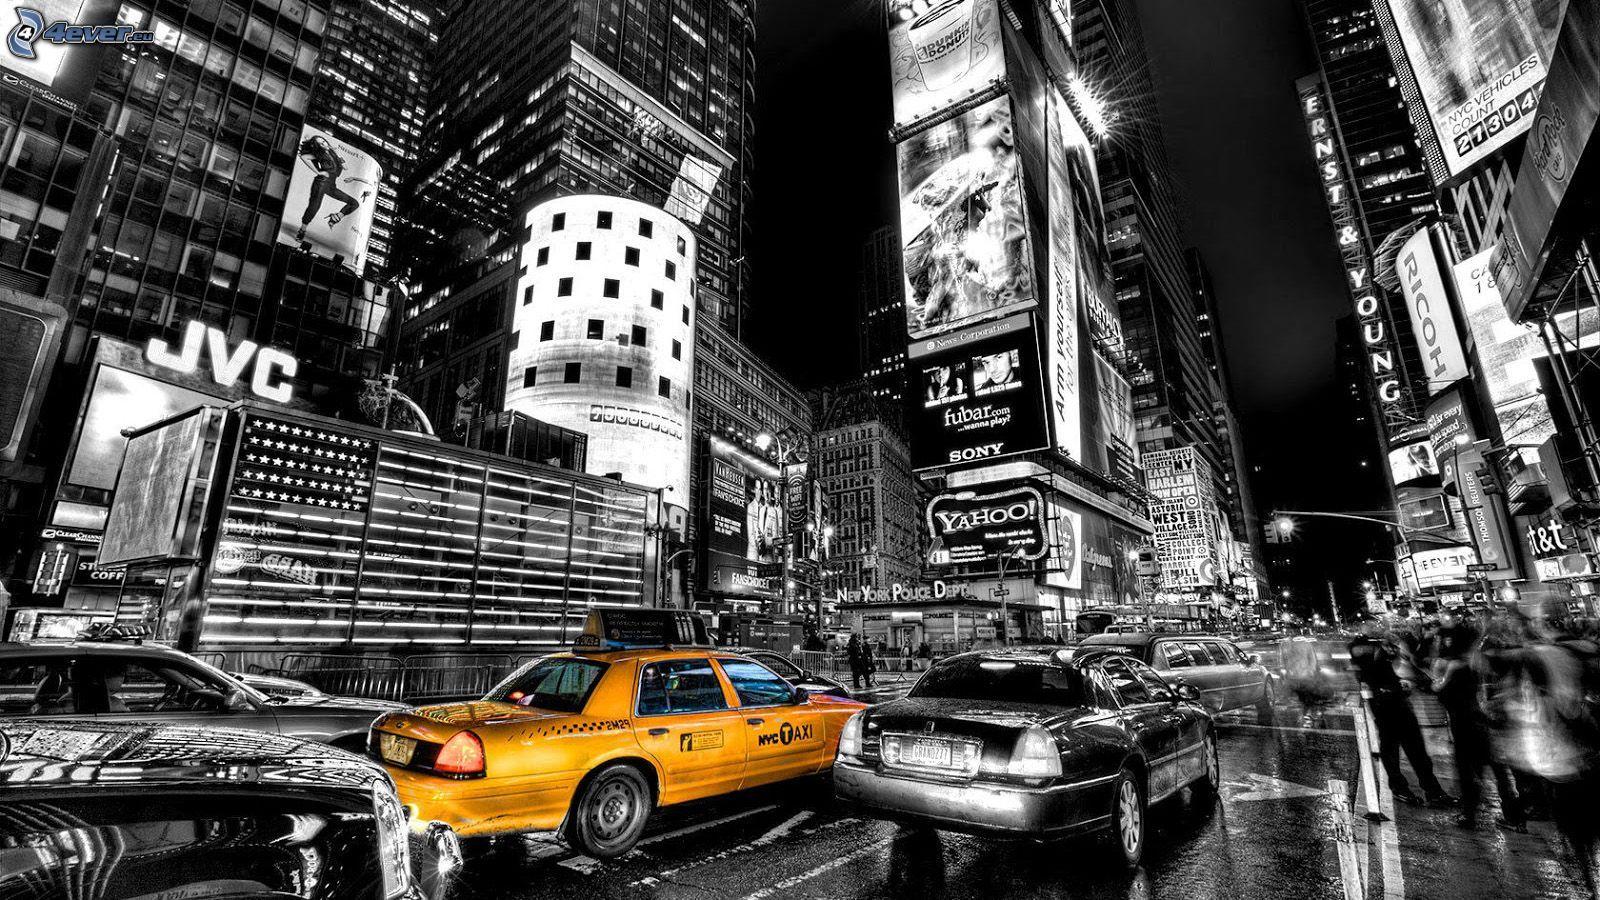 New York Taxi Wallpaper Preto E Branco Viagens Cores